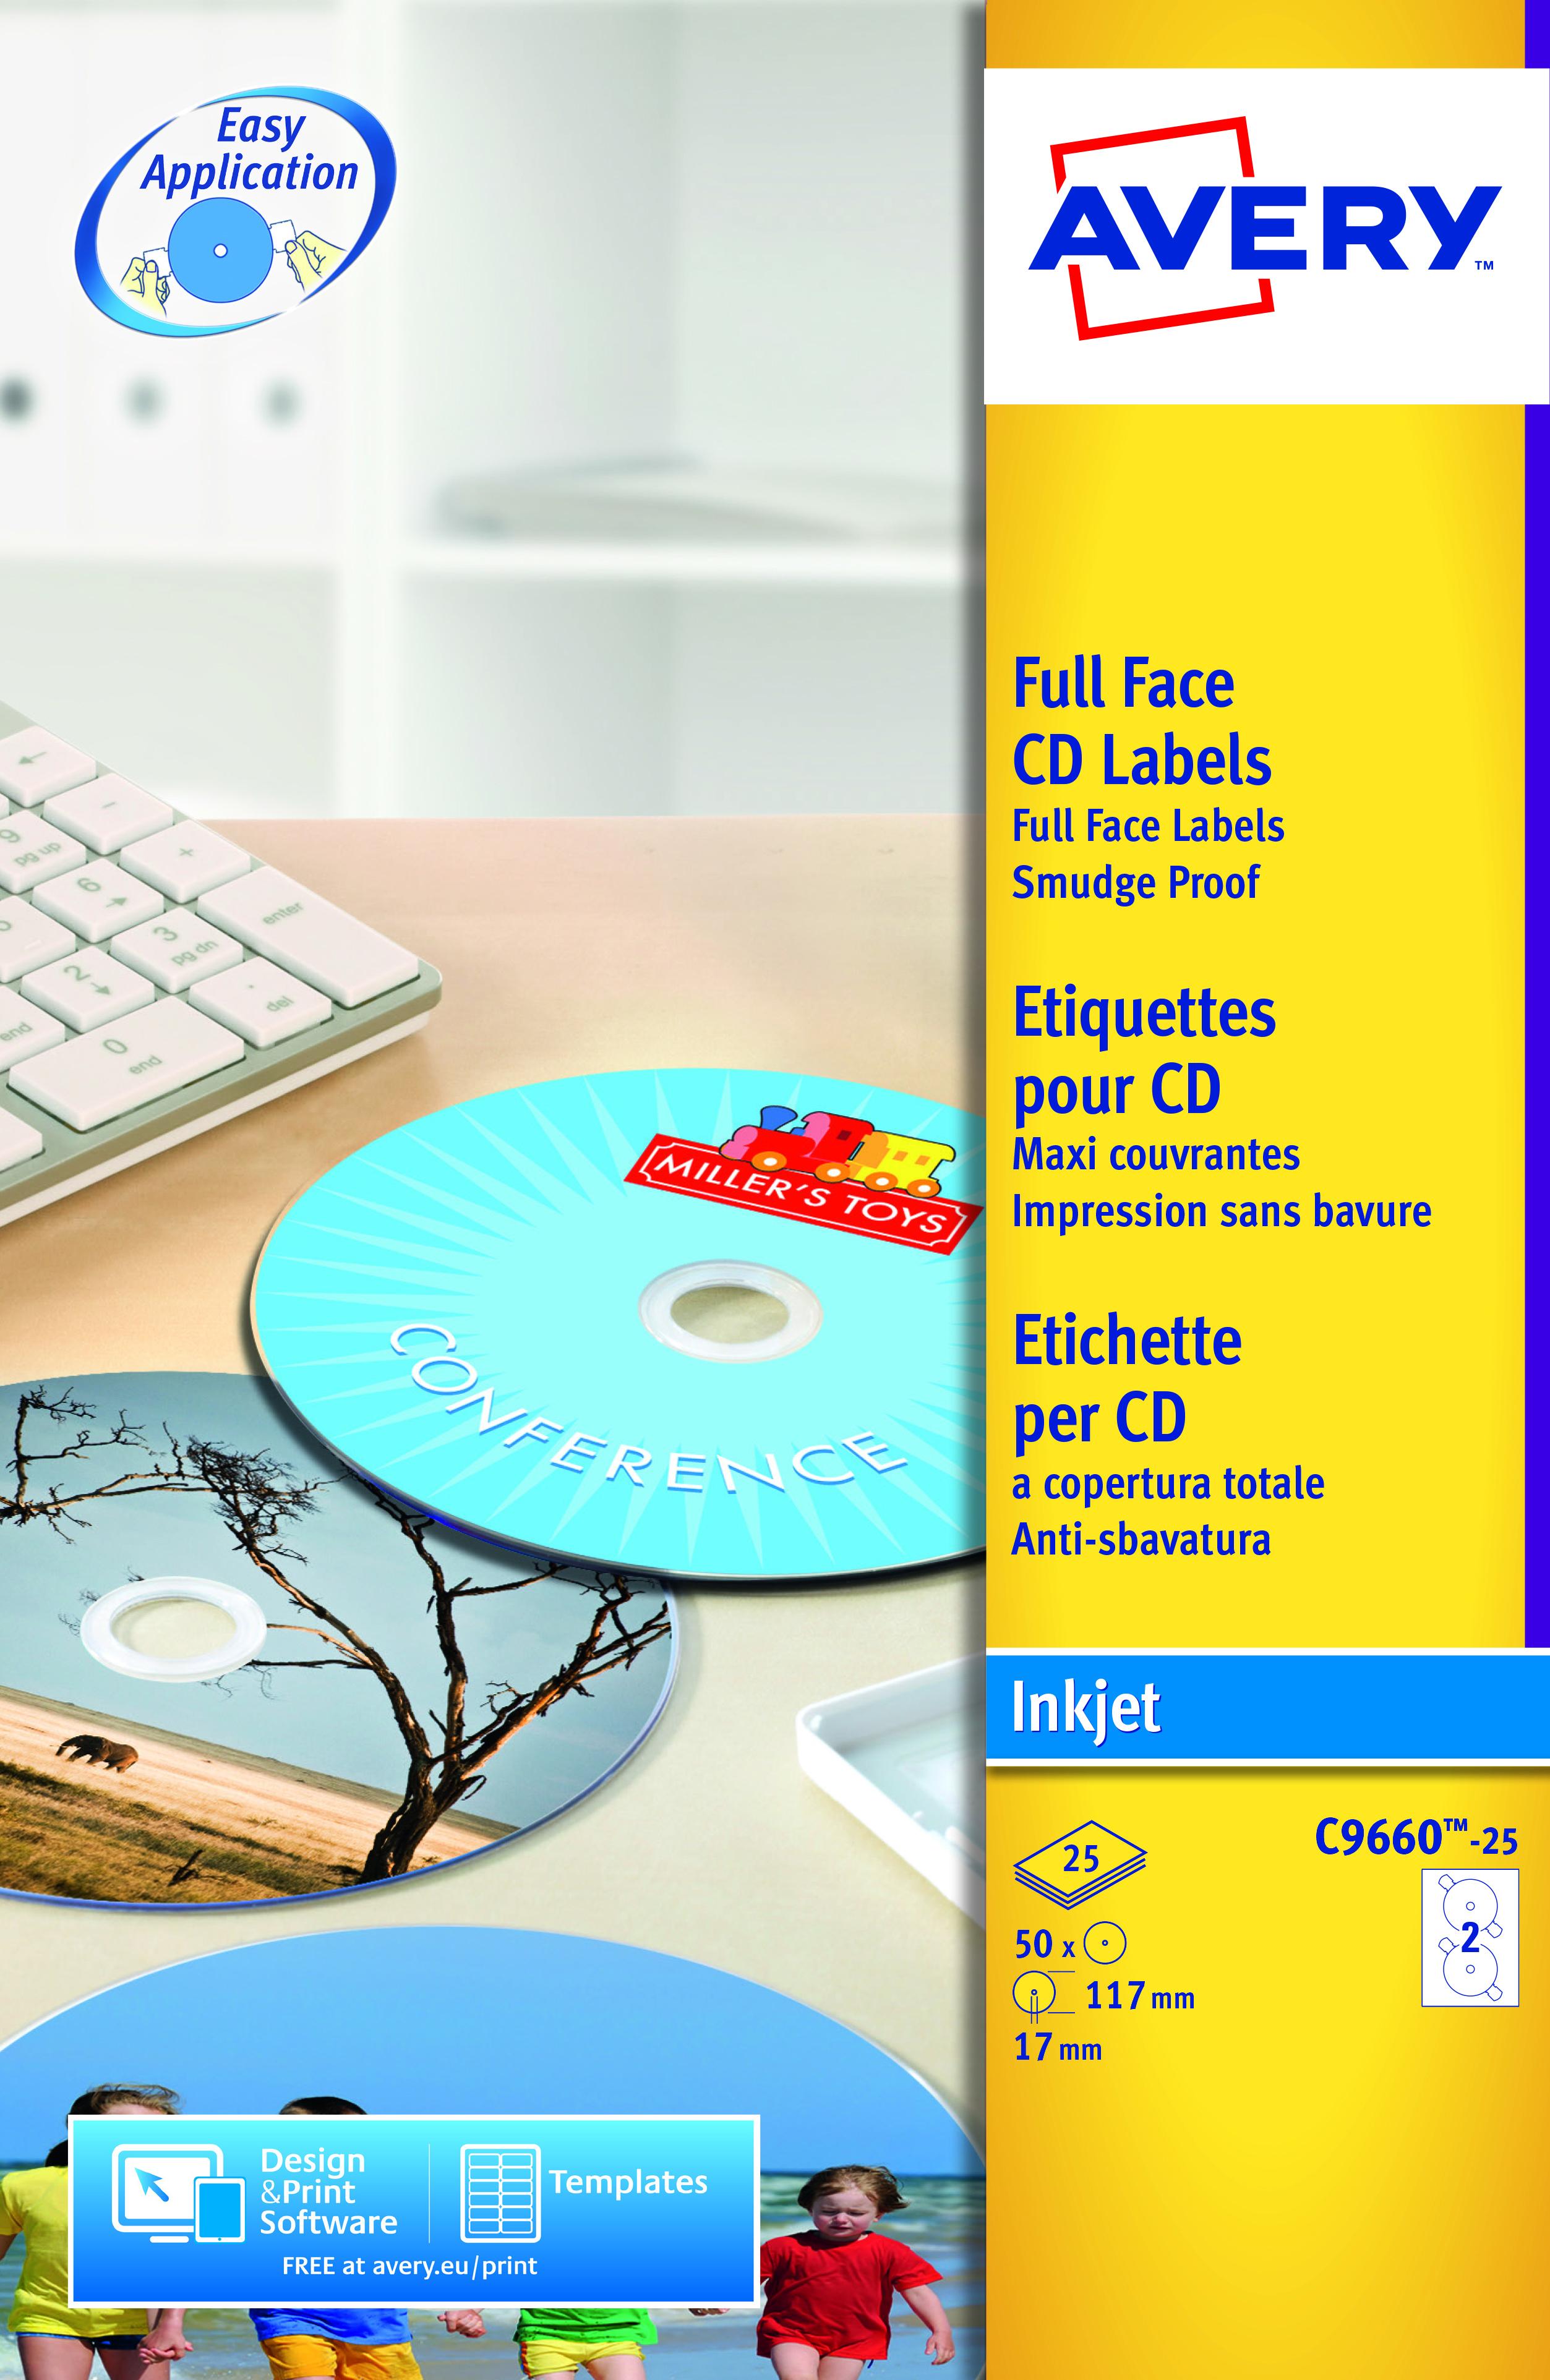 Avery Inkjet CD Labels 117mm Dia PK50